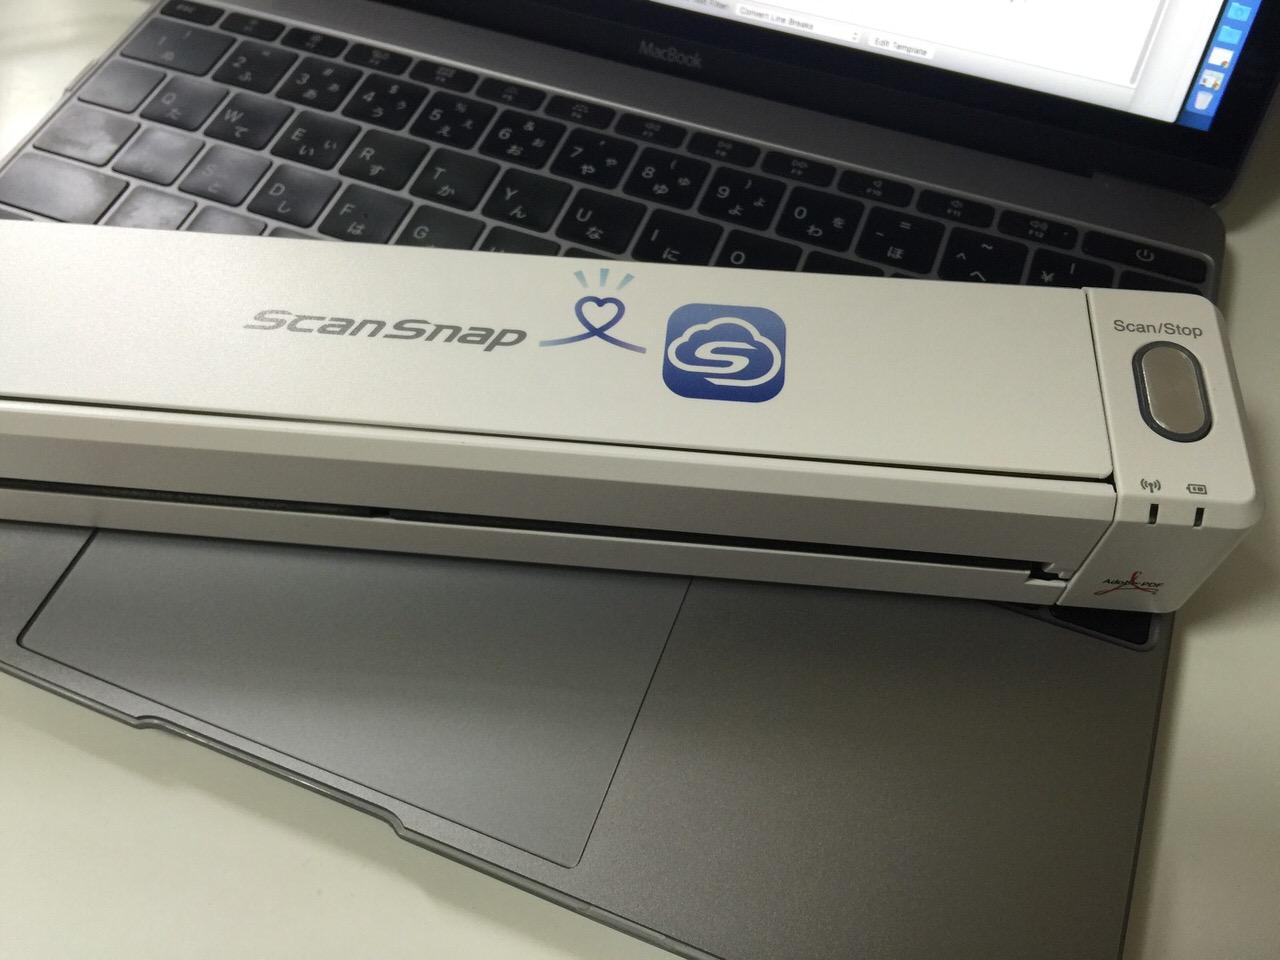 「ScanSnap Cloud」入門 vol.1 ~保存先クラウドサービスのアカウント作成~